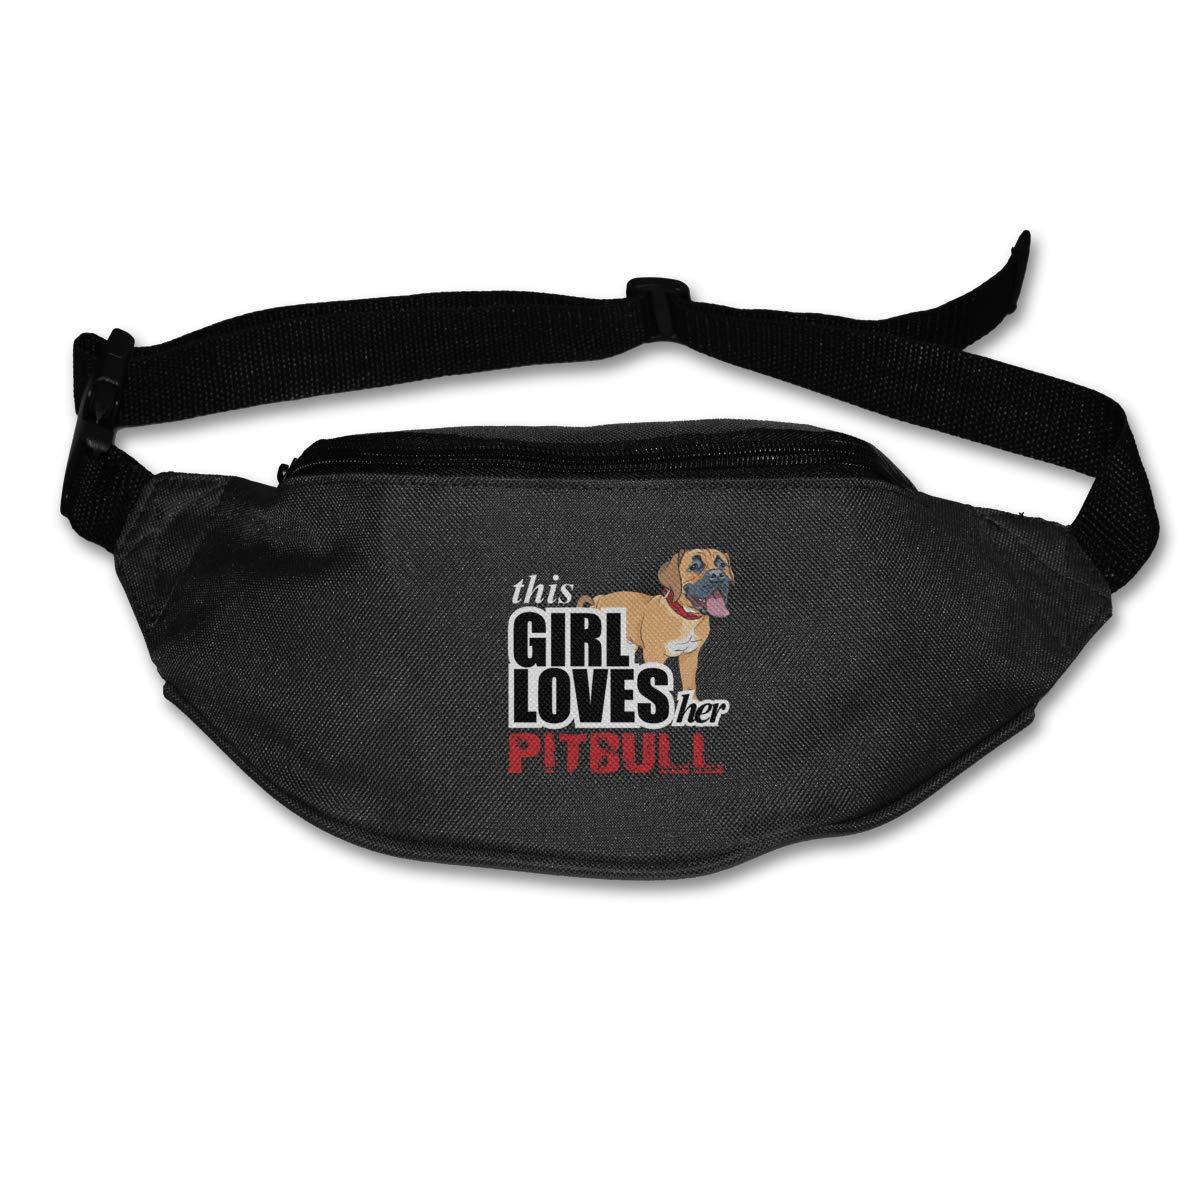 This Girl Loves Her Pit Bull Sport Waist Pack Fanny Pack Adjustable For Travel